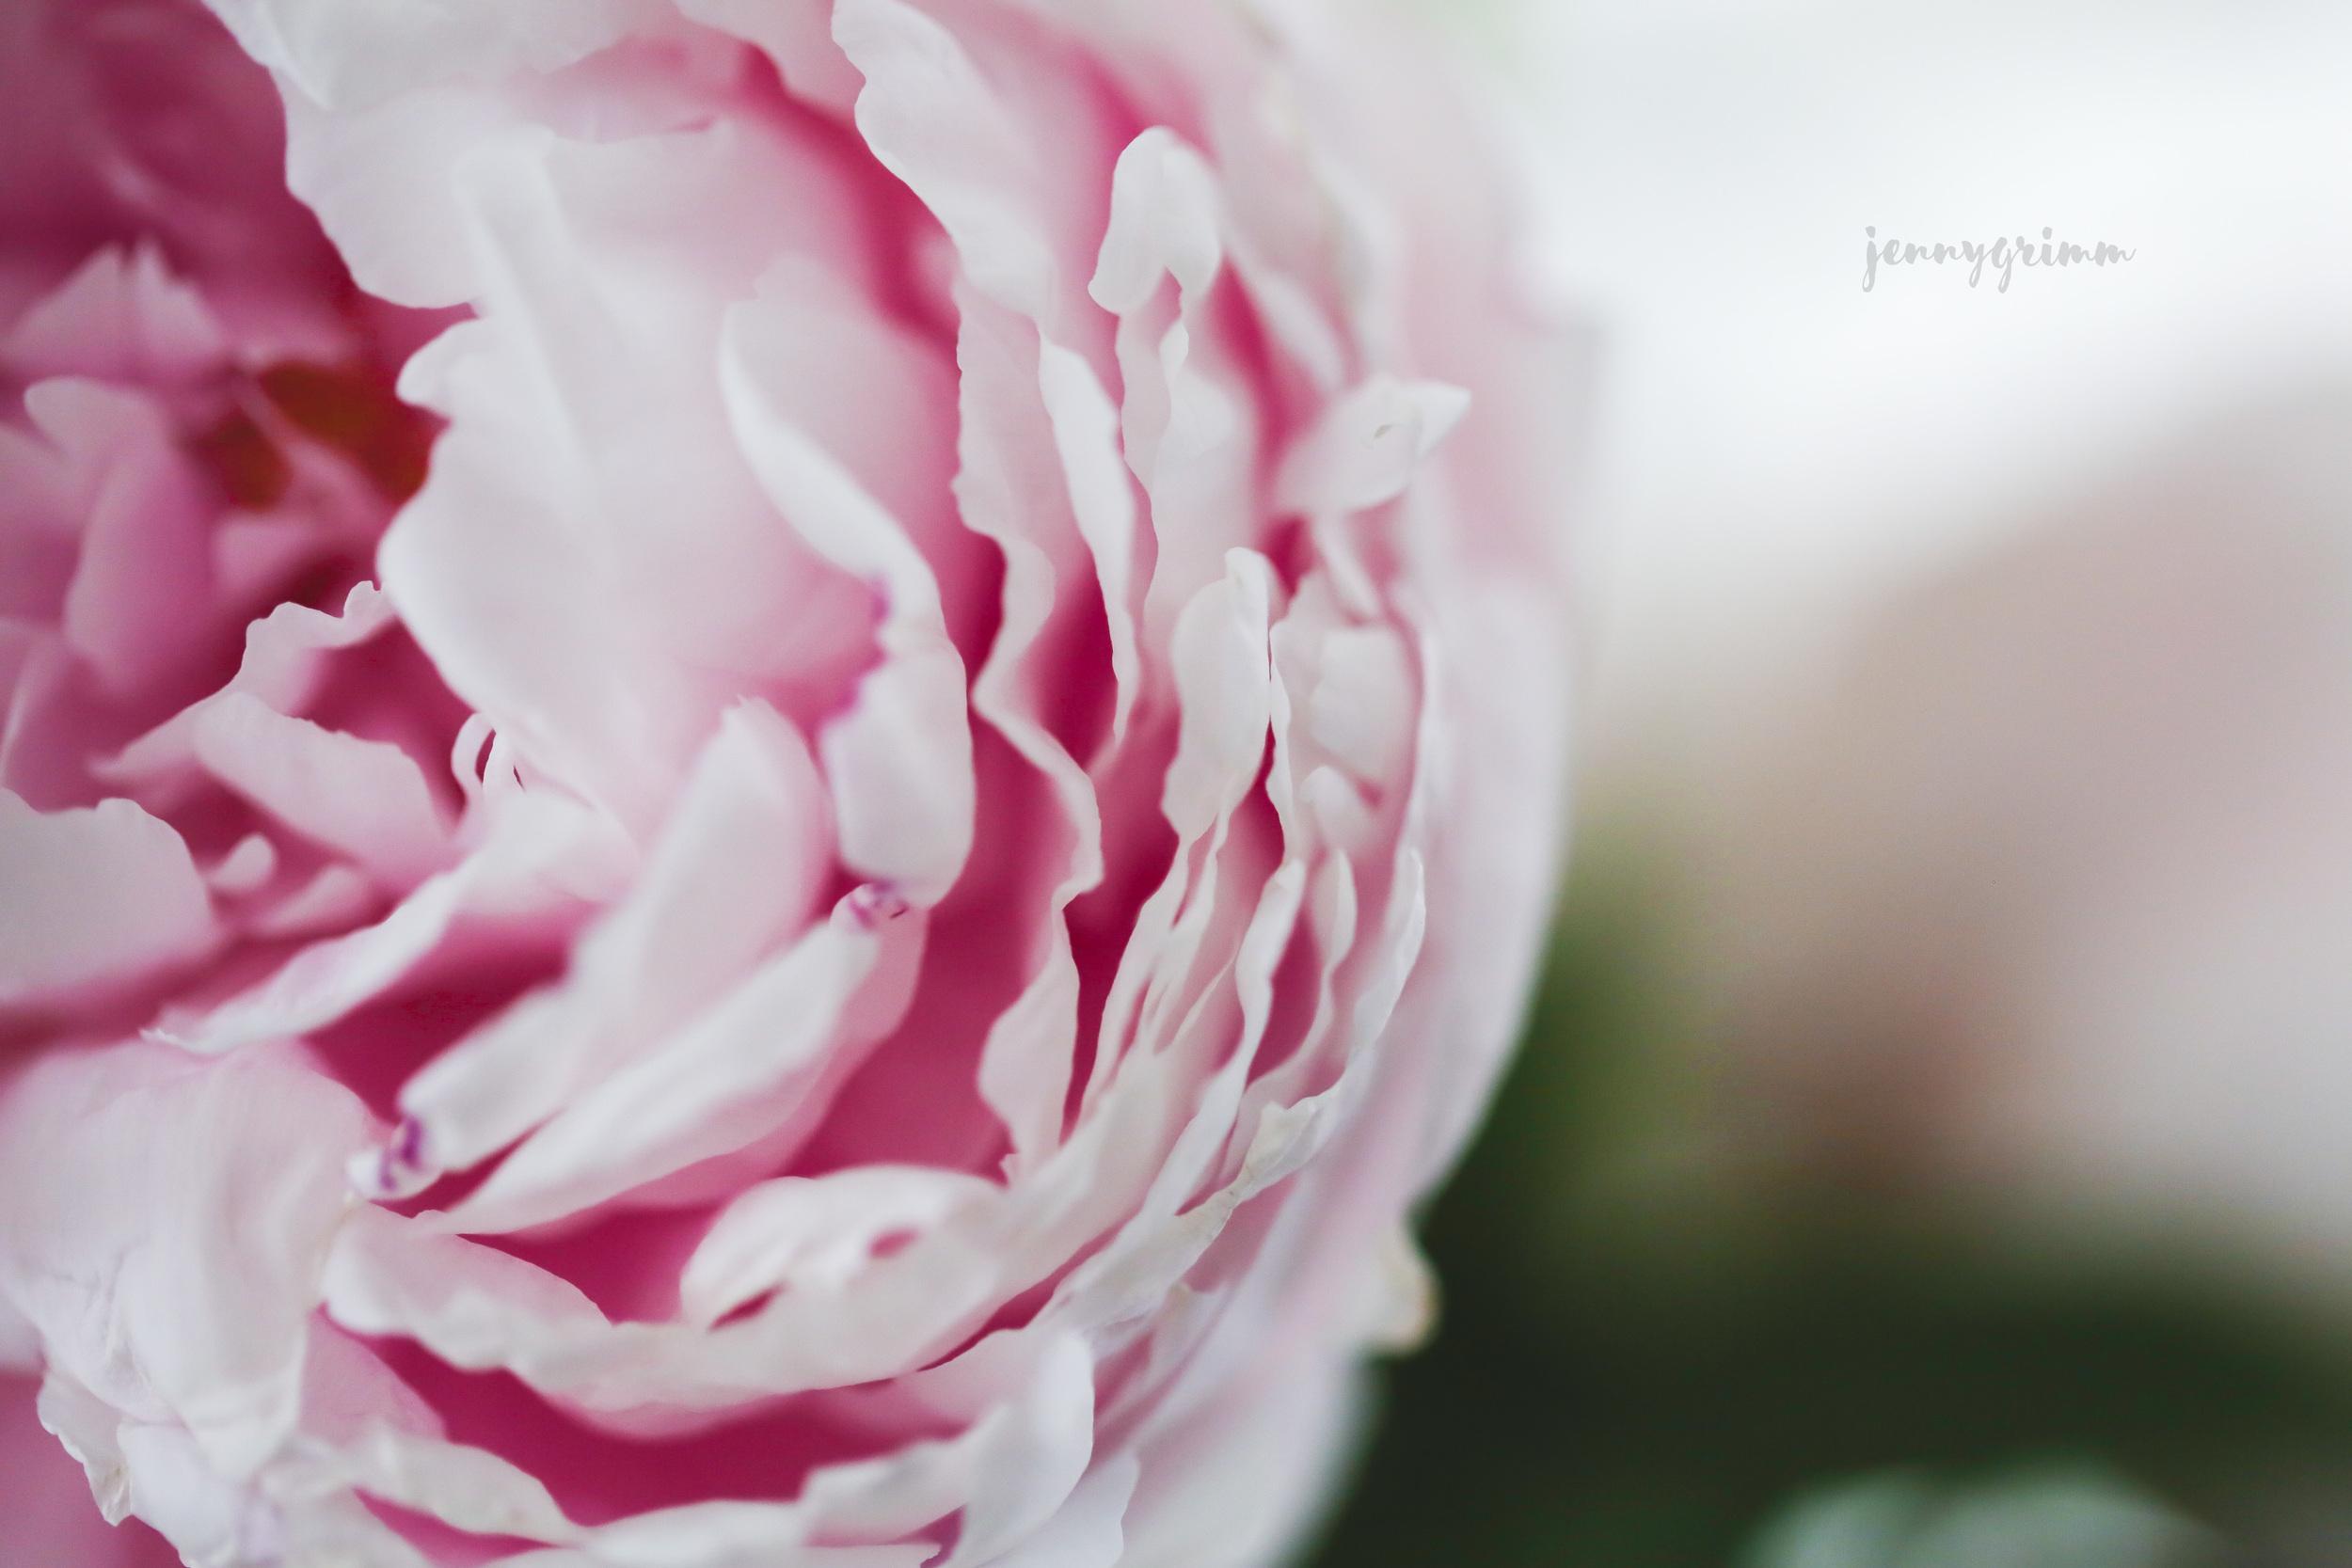 peony petal layers